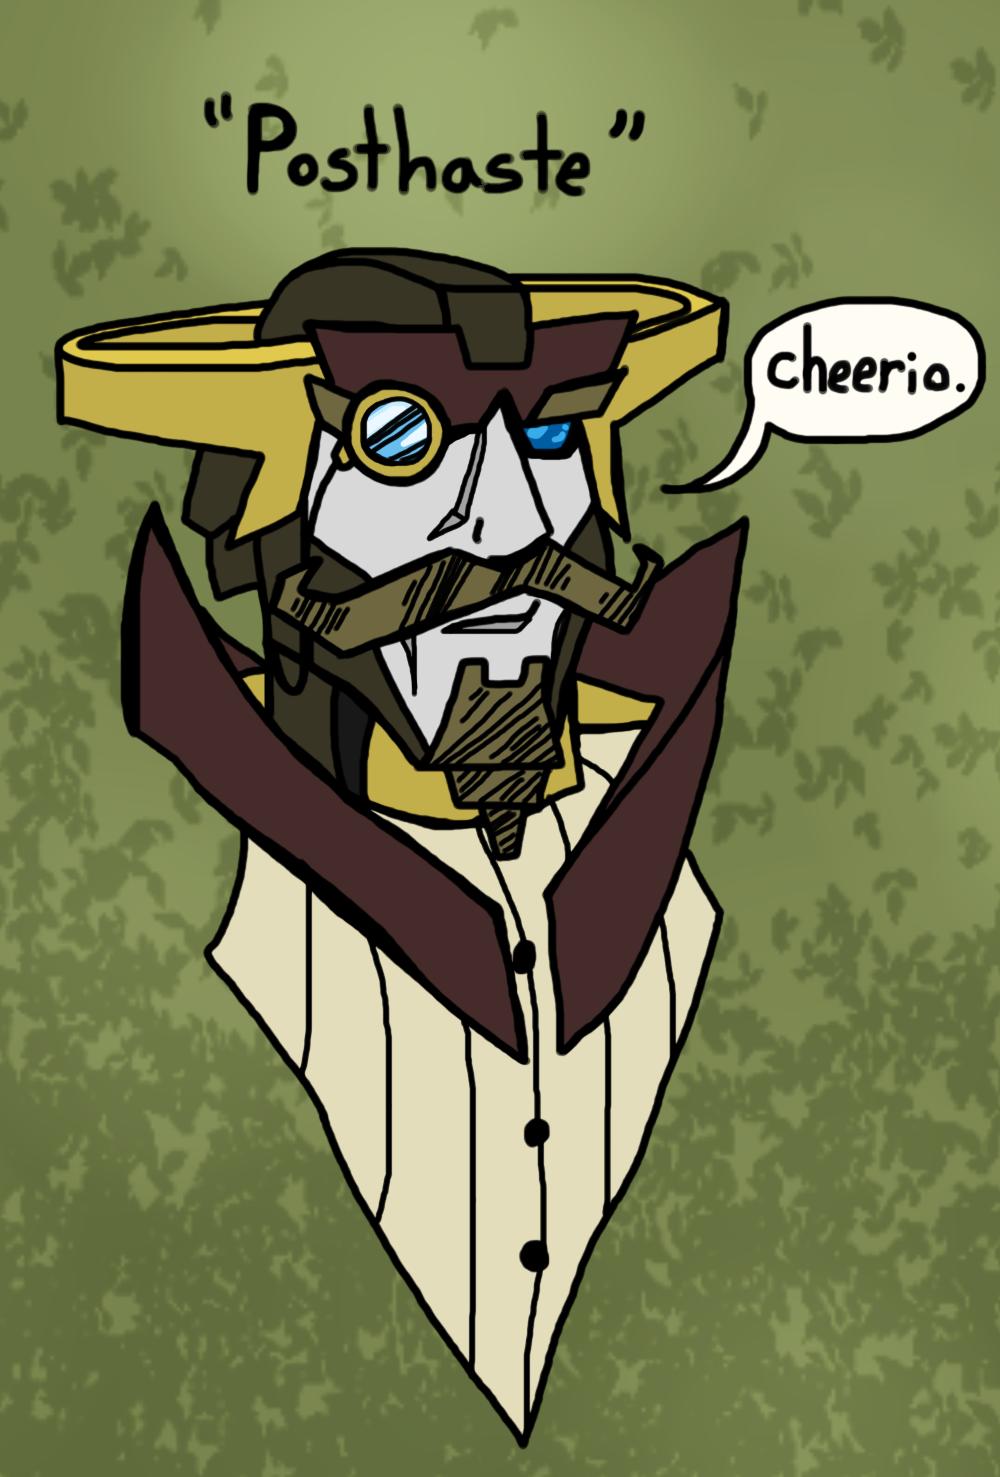 Bad Random Transformer Names: POSTHASTE